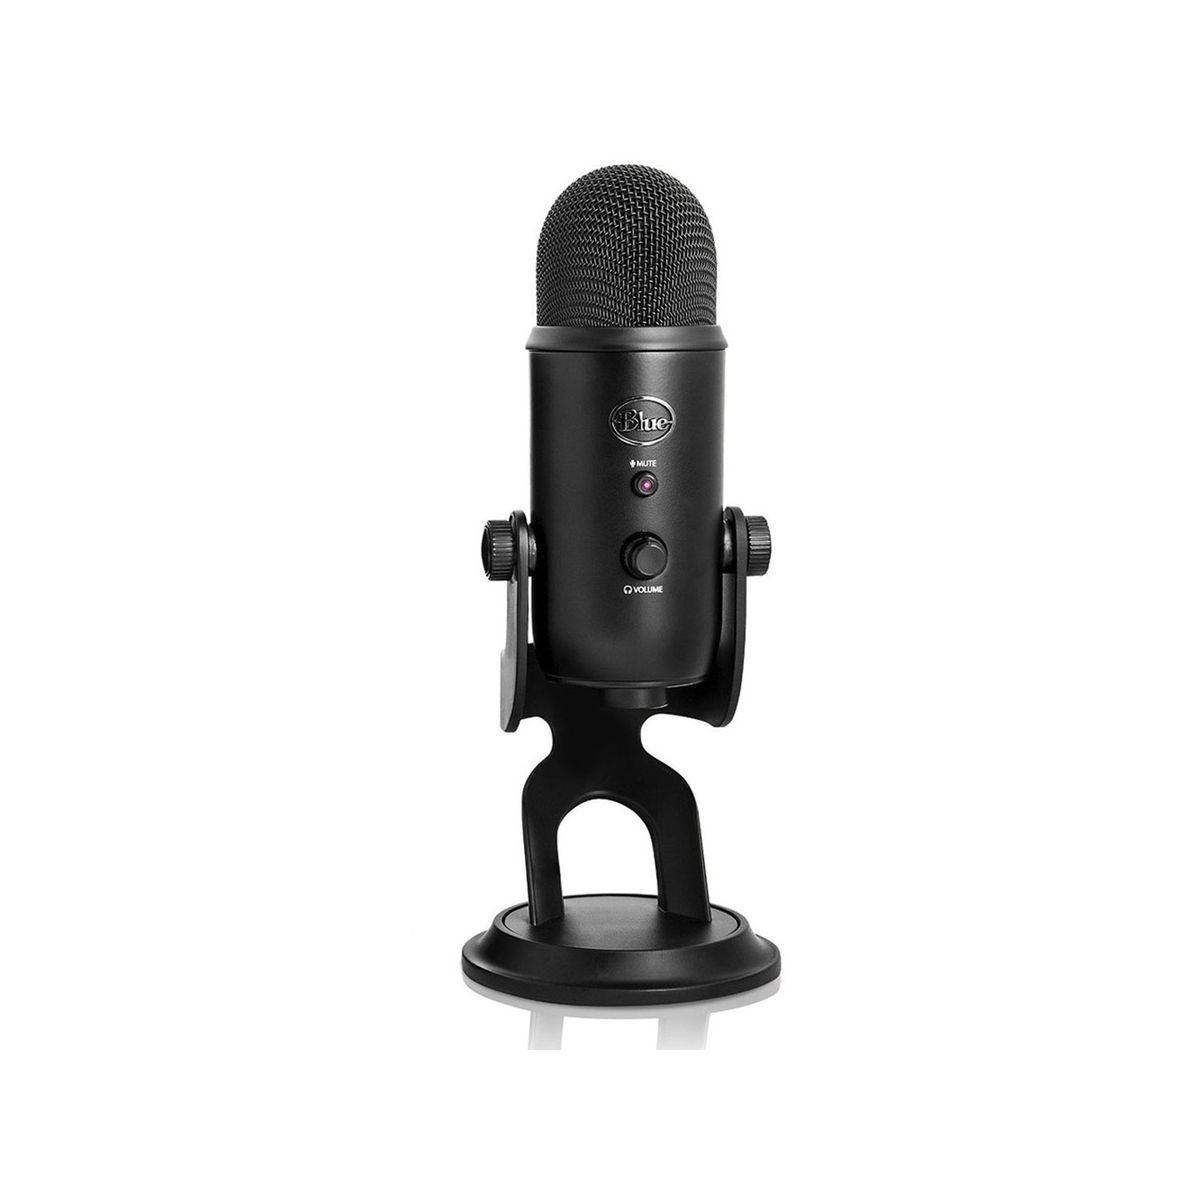 Micro gamer blue microphones yeti black - livraison offerte : code premium (photo)